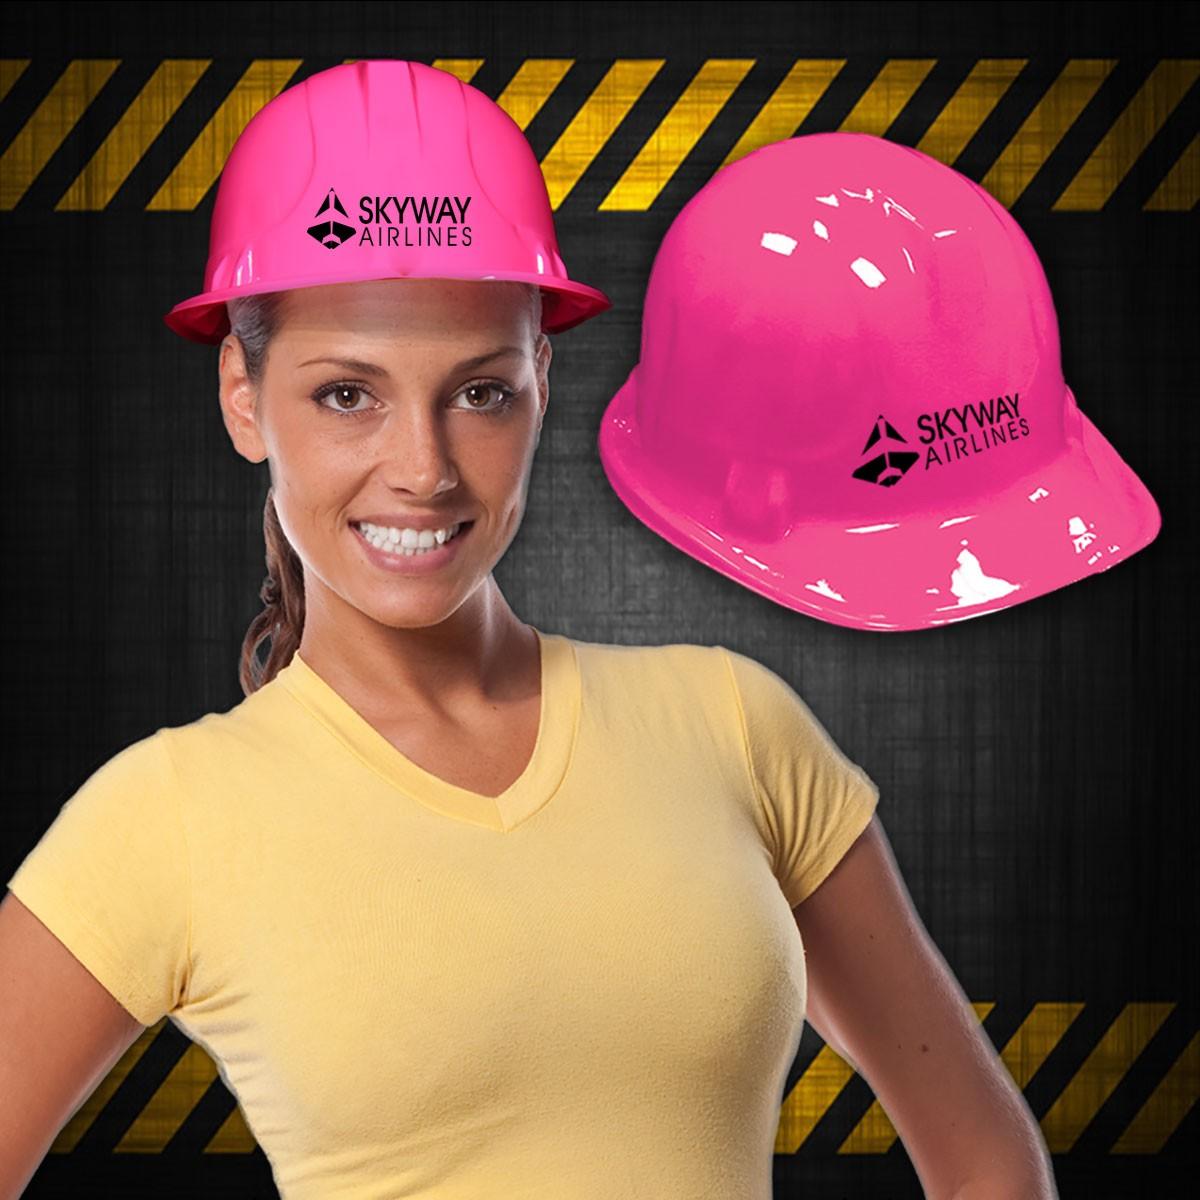 Pink Plastic Construction Hat